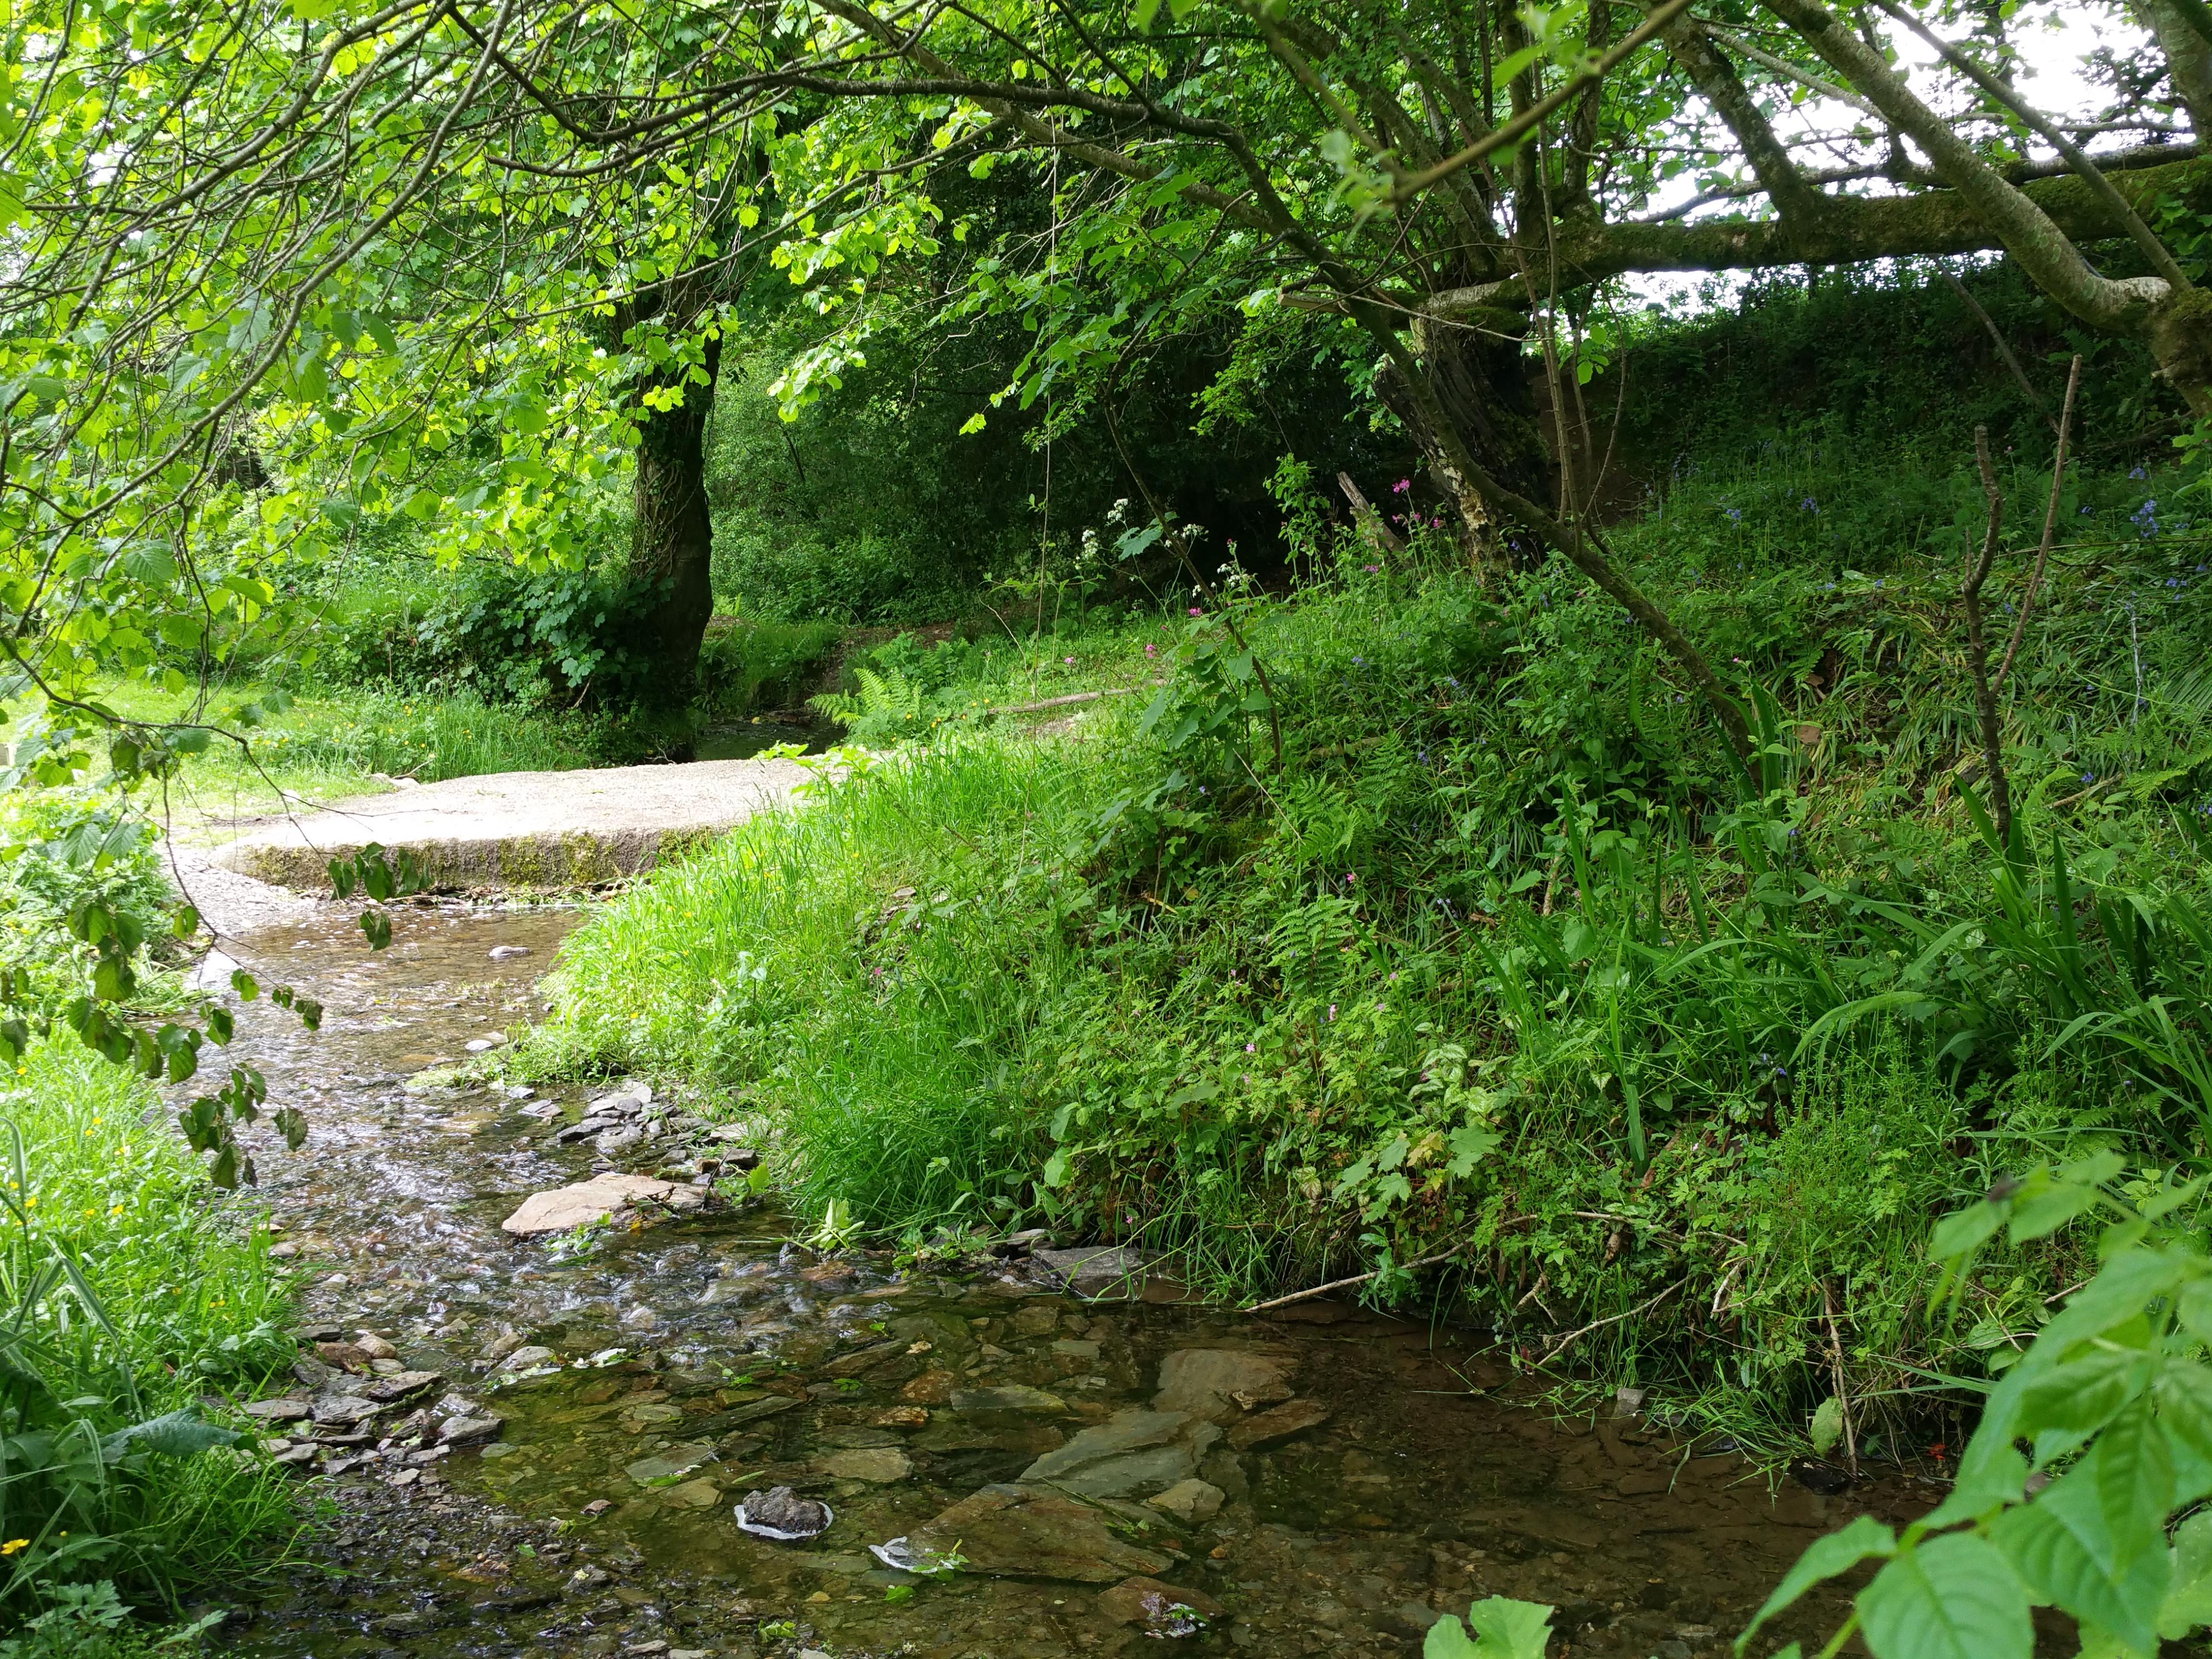 Stream and woodlands